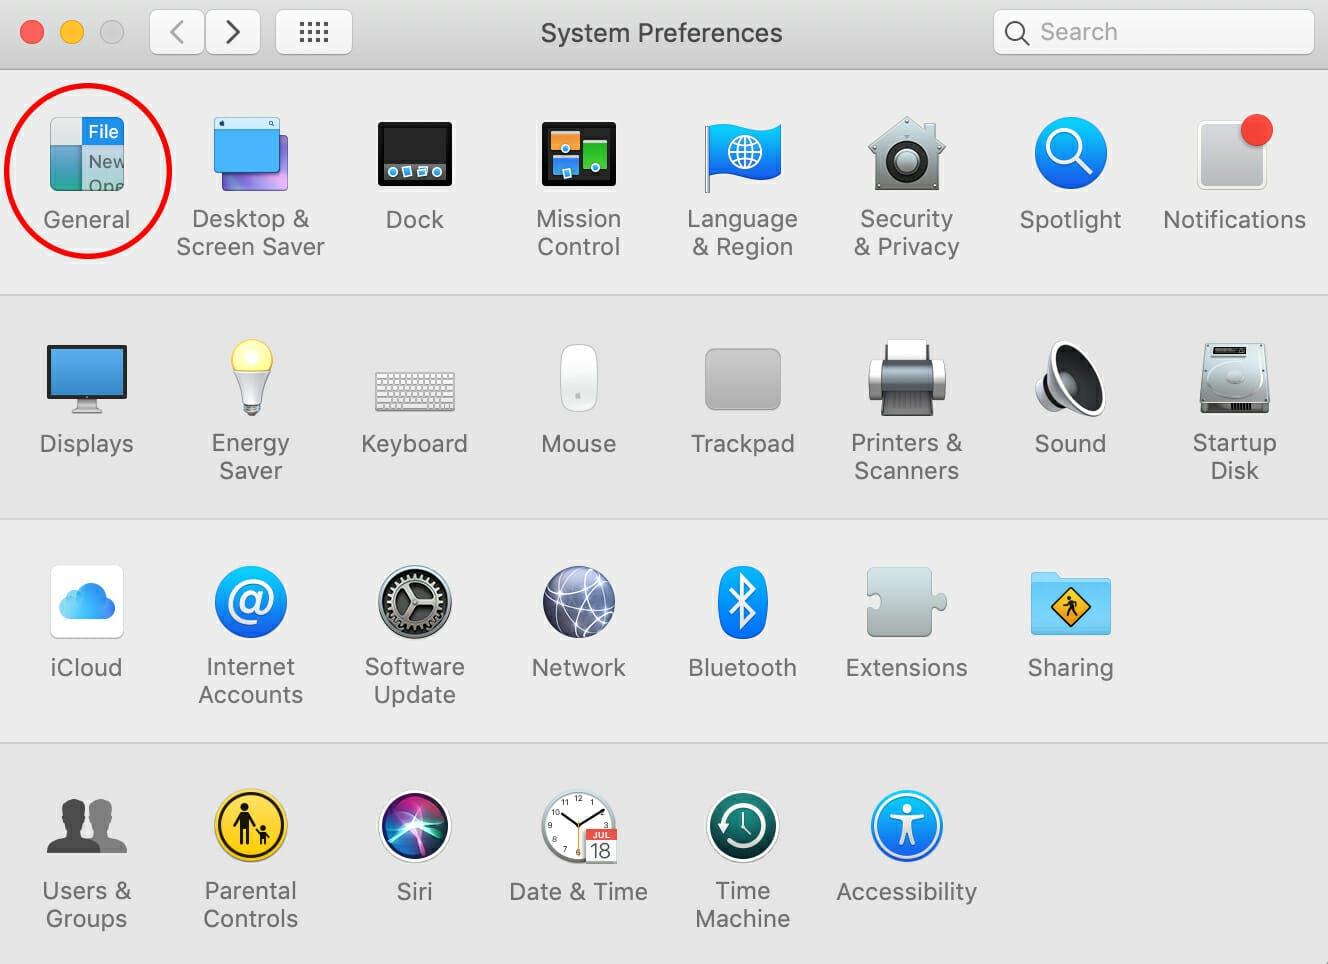 google chrome dark mode - system preferences